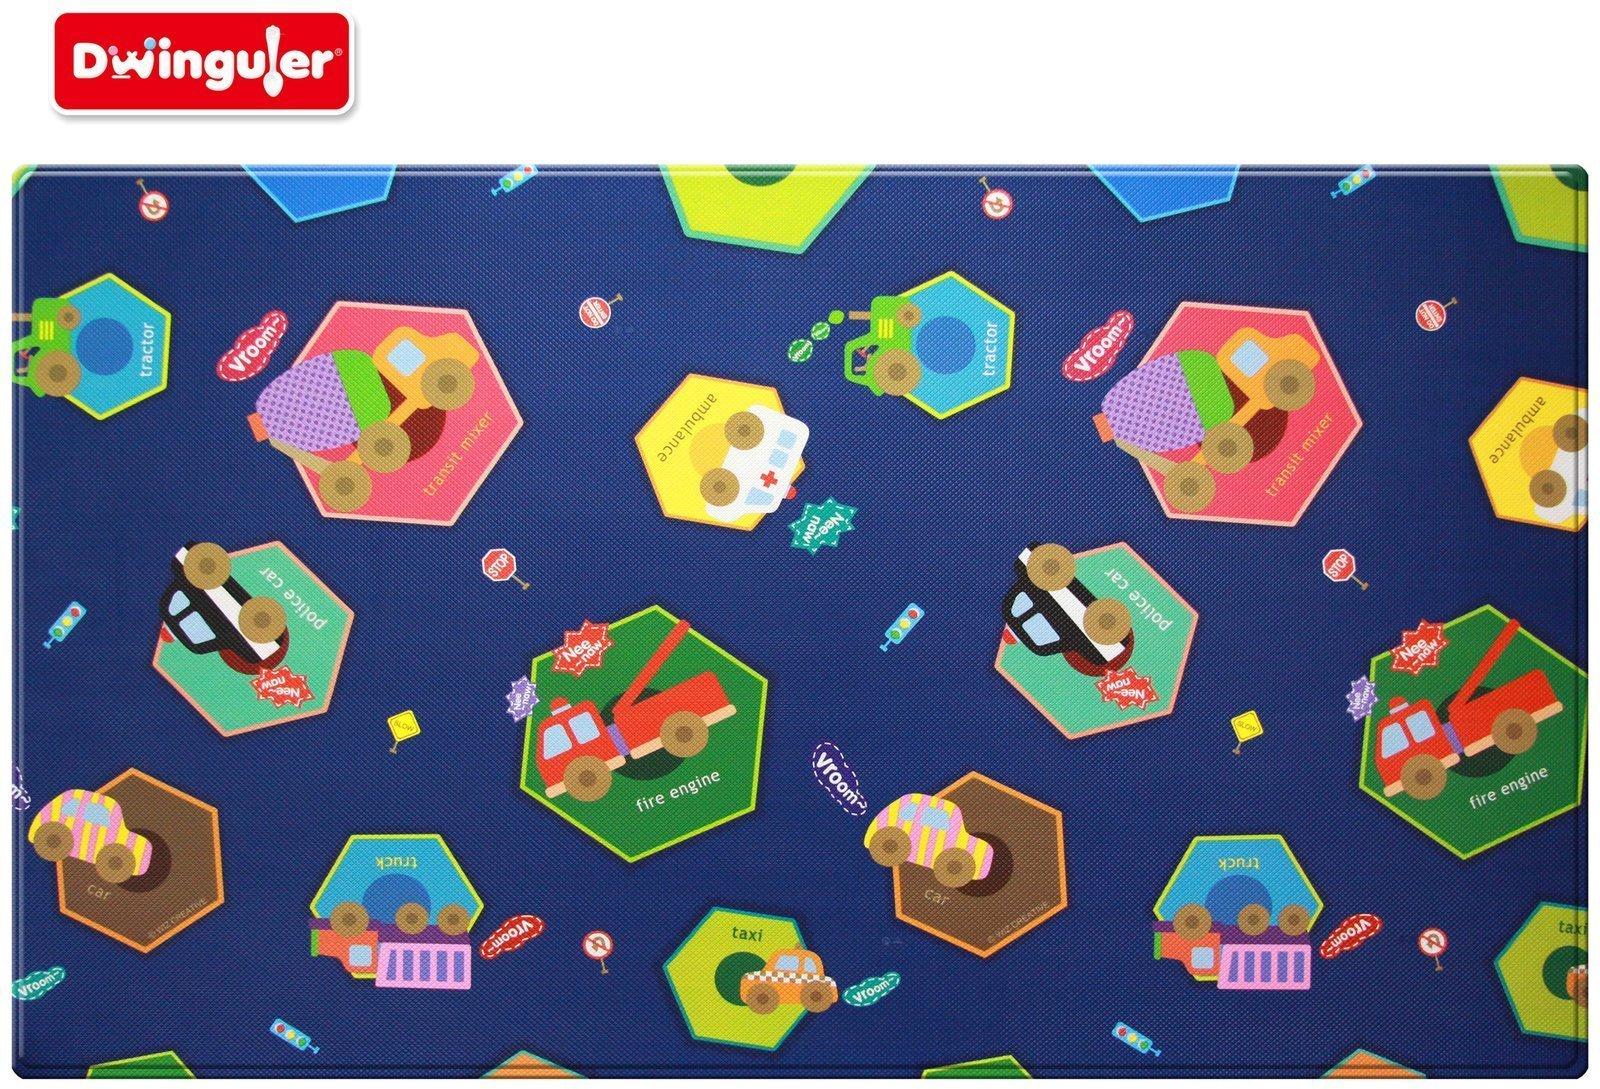 Dwinguler My Town Large Kid's Playmat by Dwinguler (Image #2)